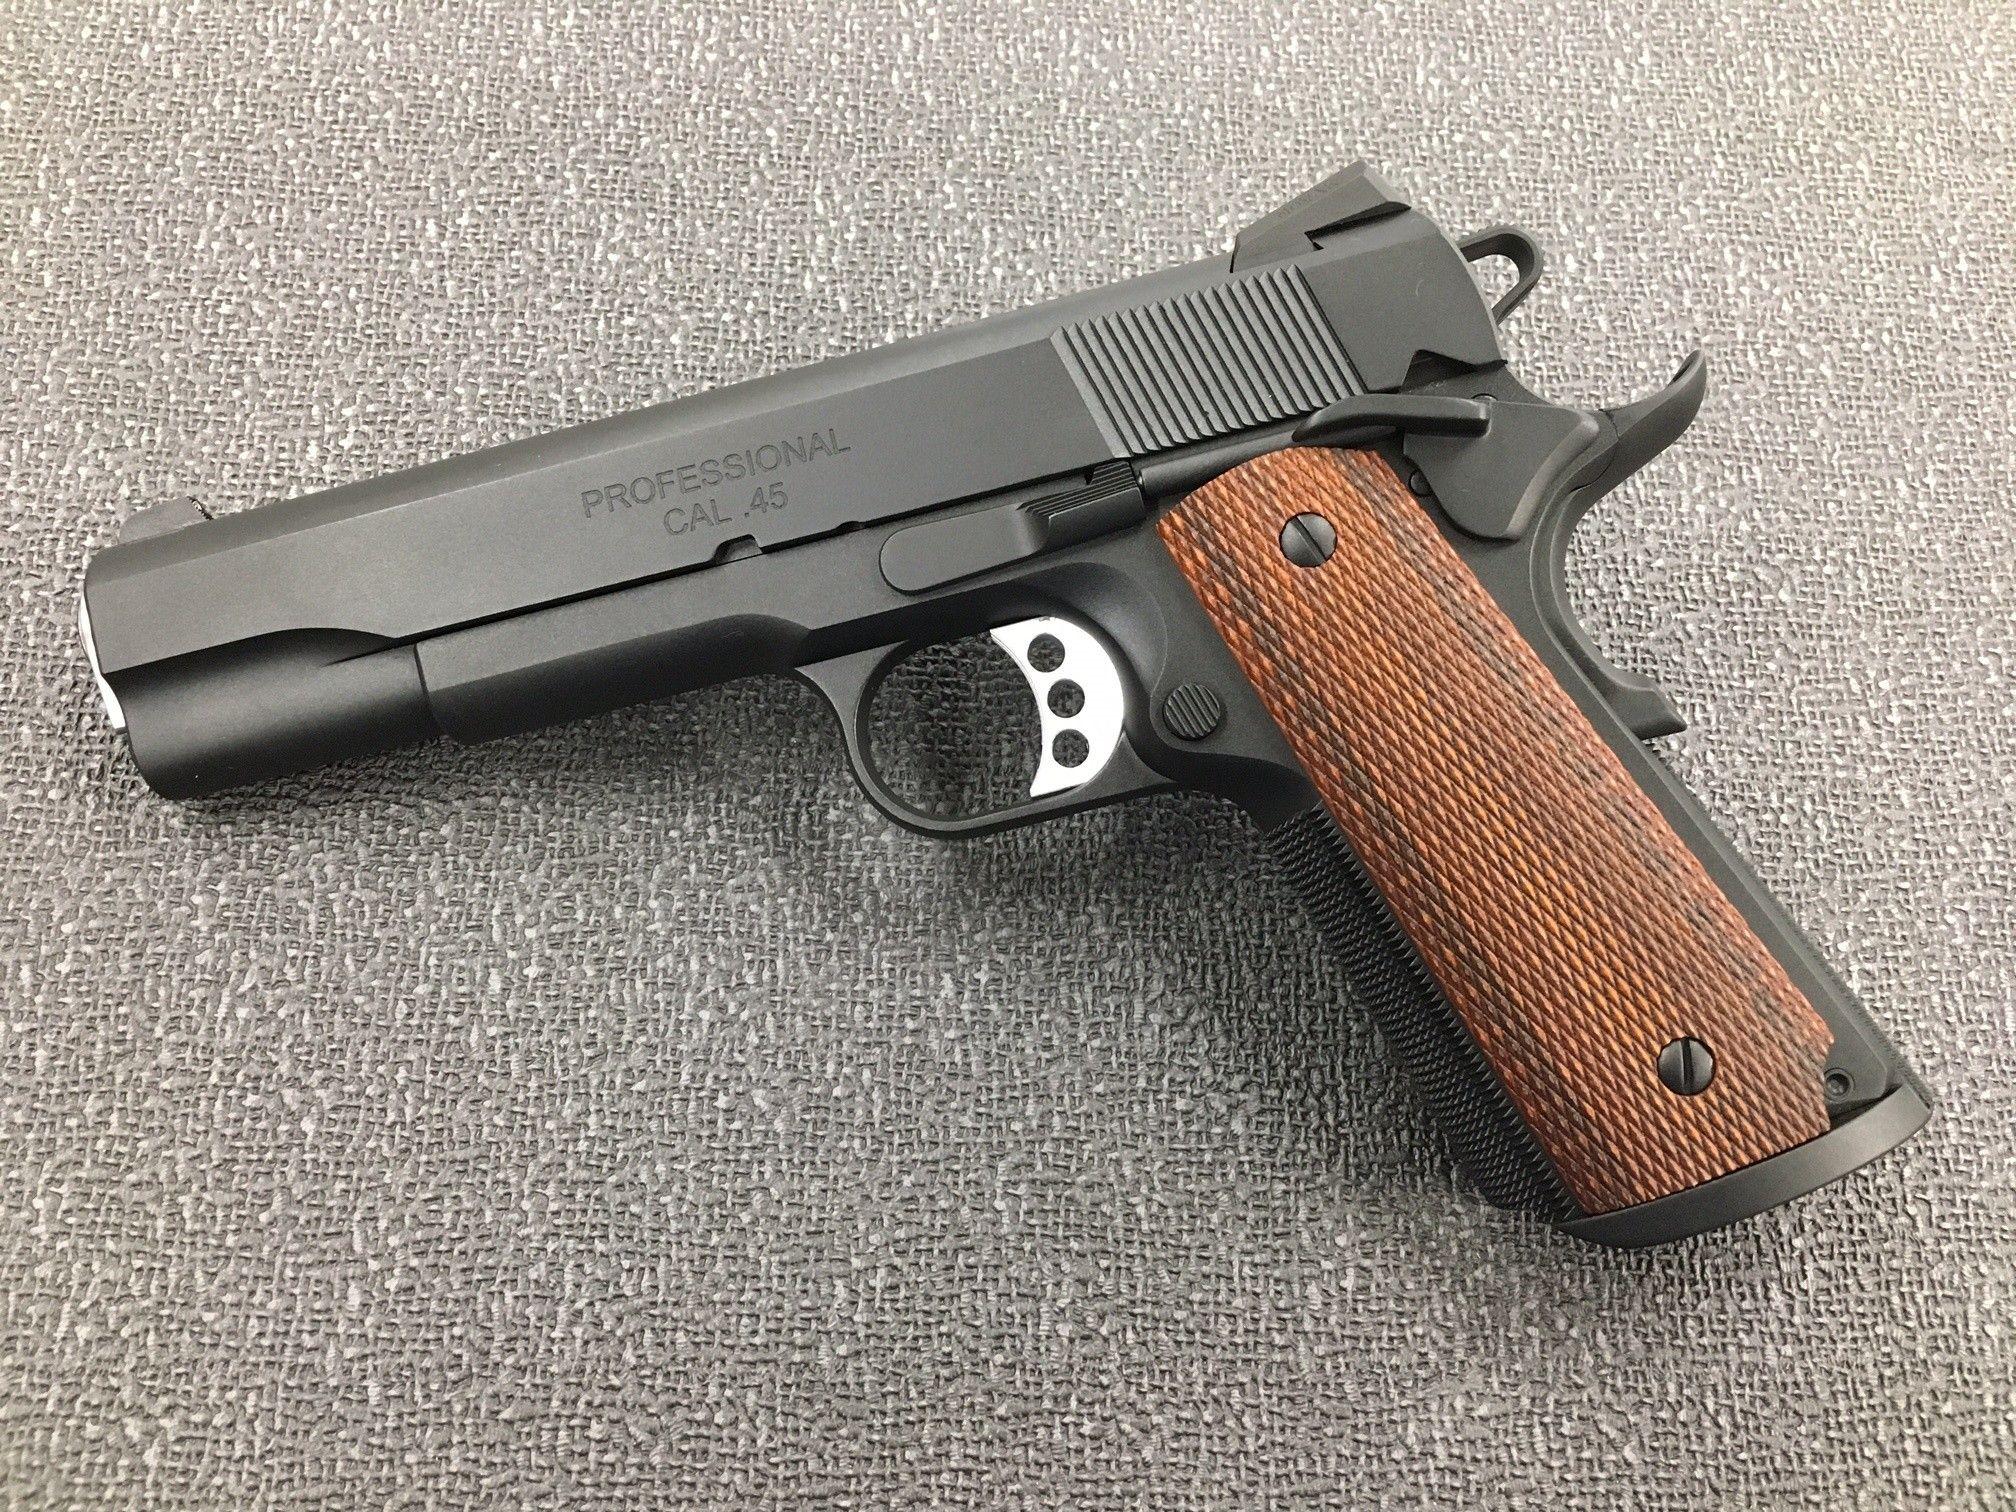 Springfield Armory PC9111 Professional 1911-A1 45 ACP Pistol